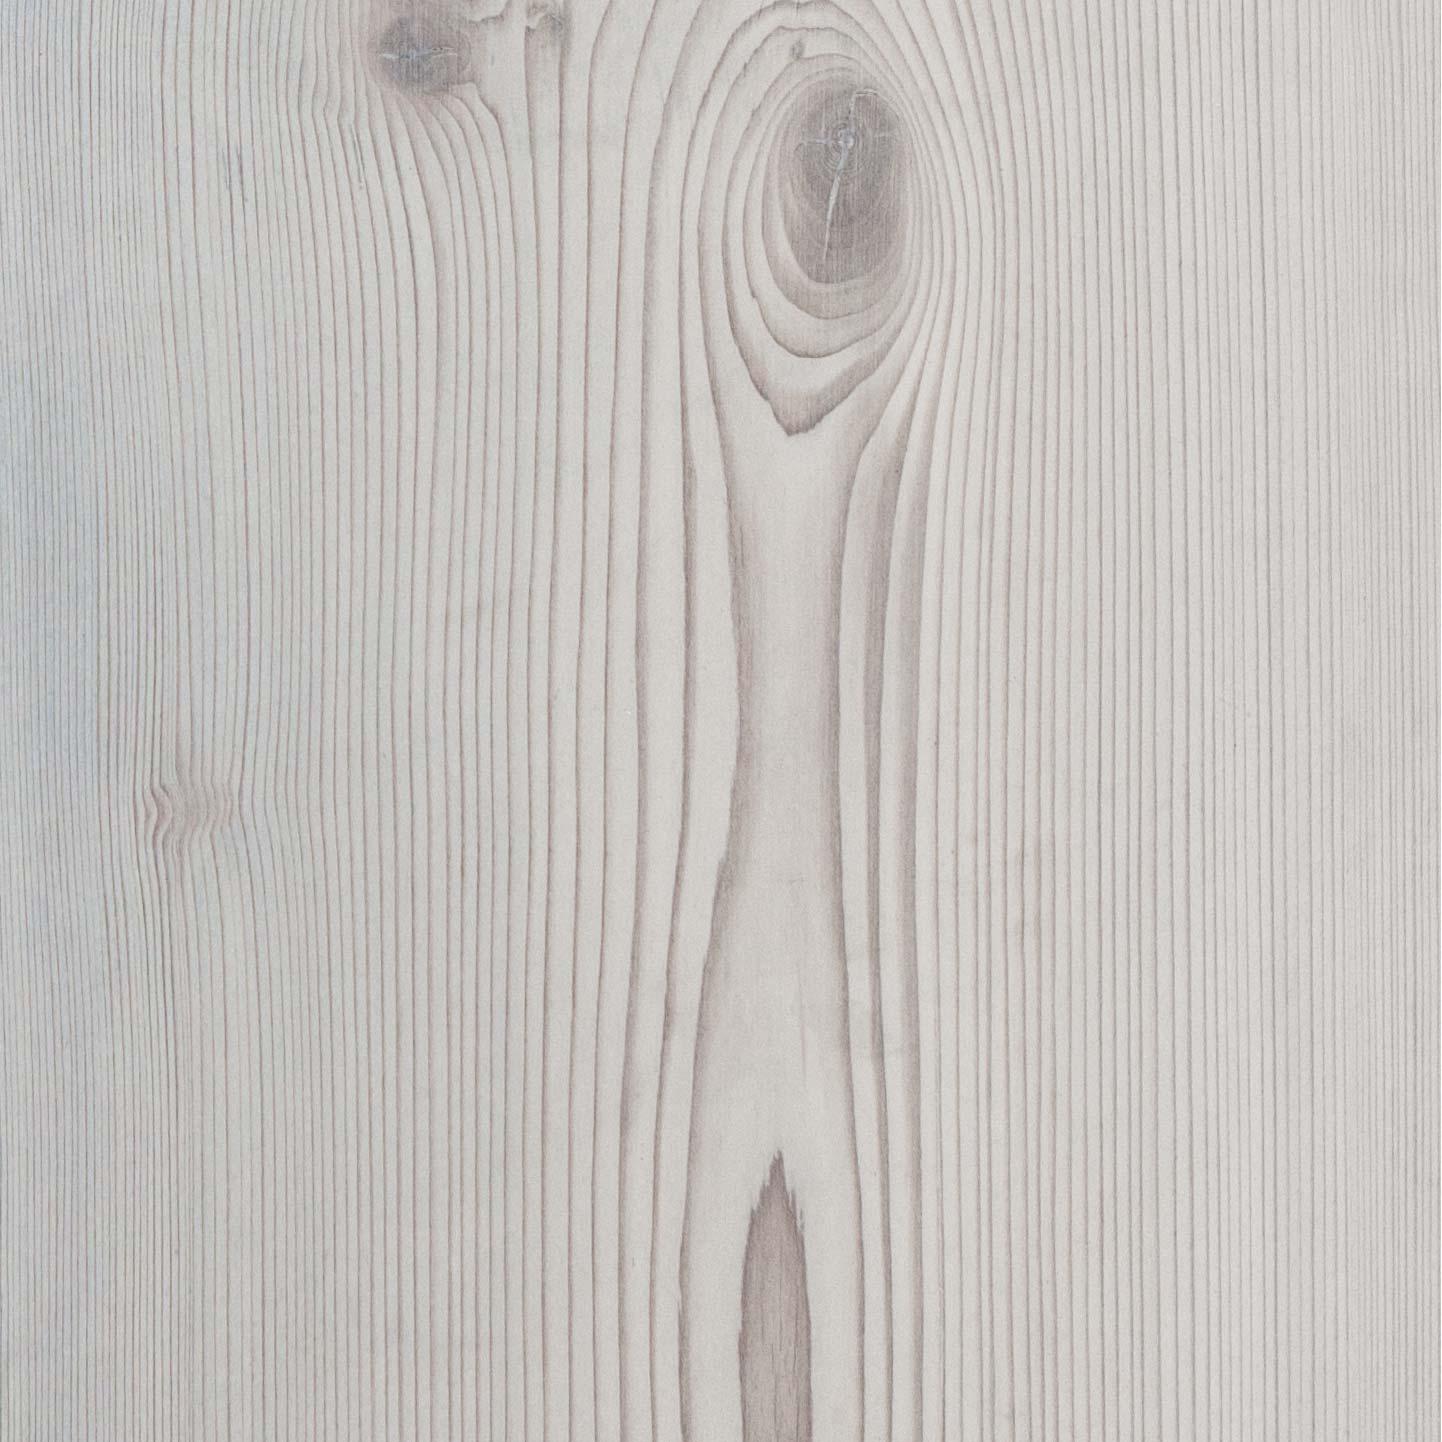 Element7-wide-plank-samples-luna-larch-white-oil-lye-IMG_9116